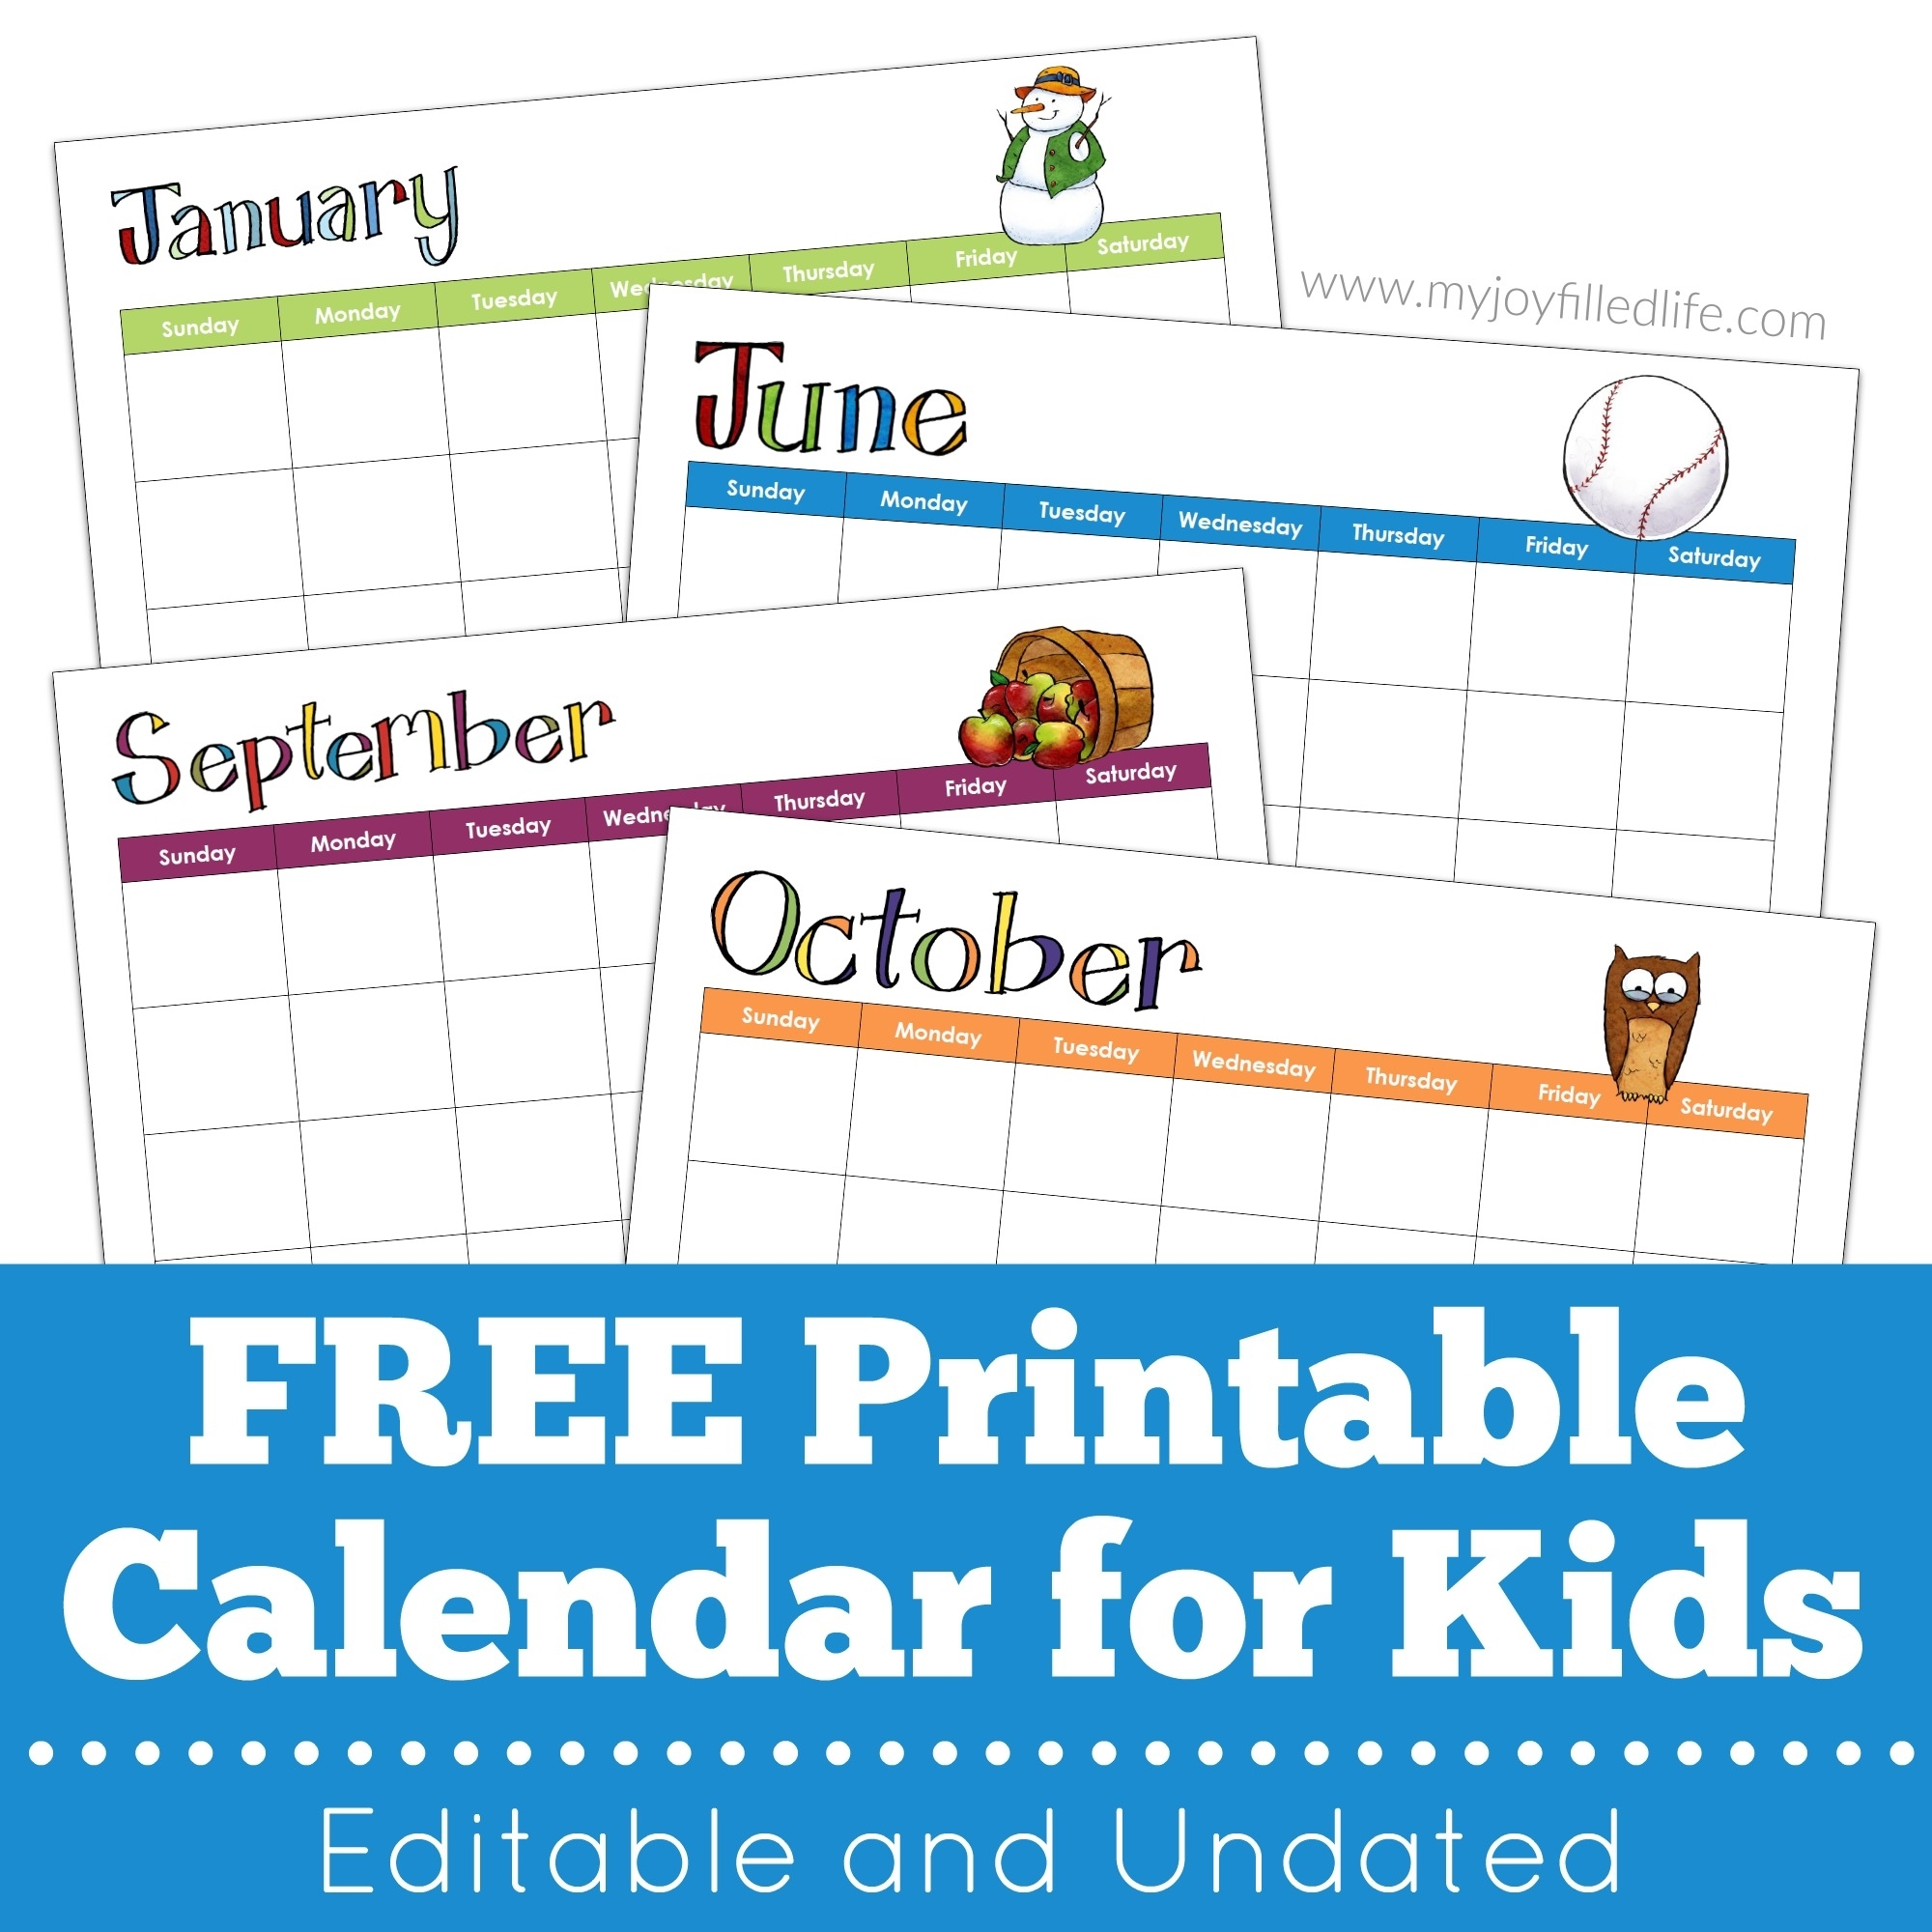 Free Printable Calendar For Kids – Editable & Undated - My